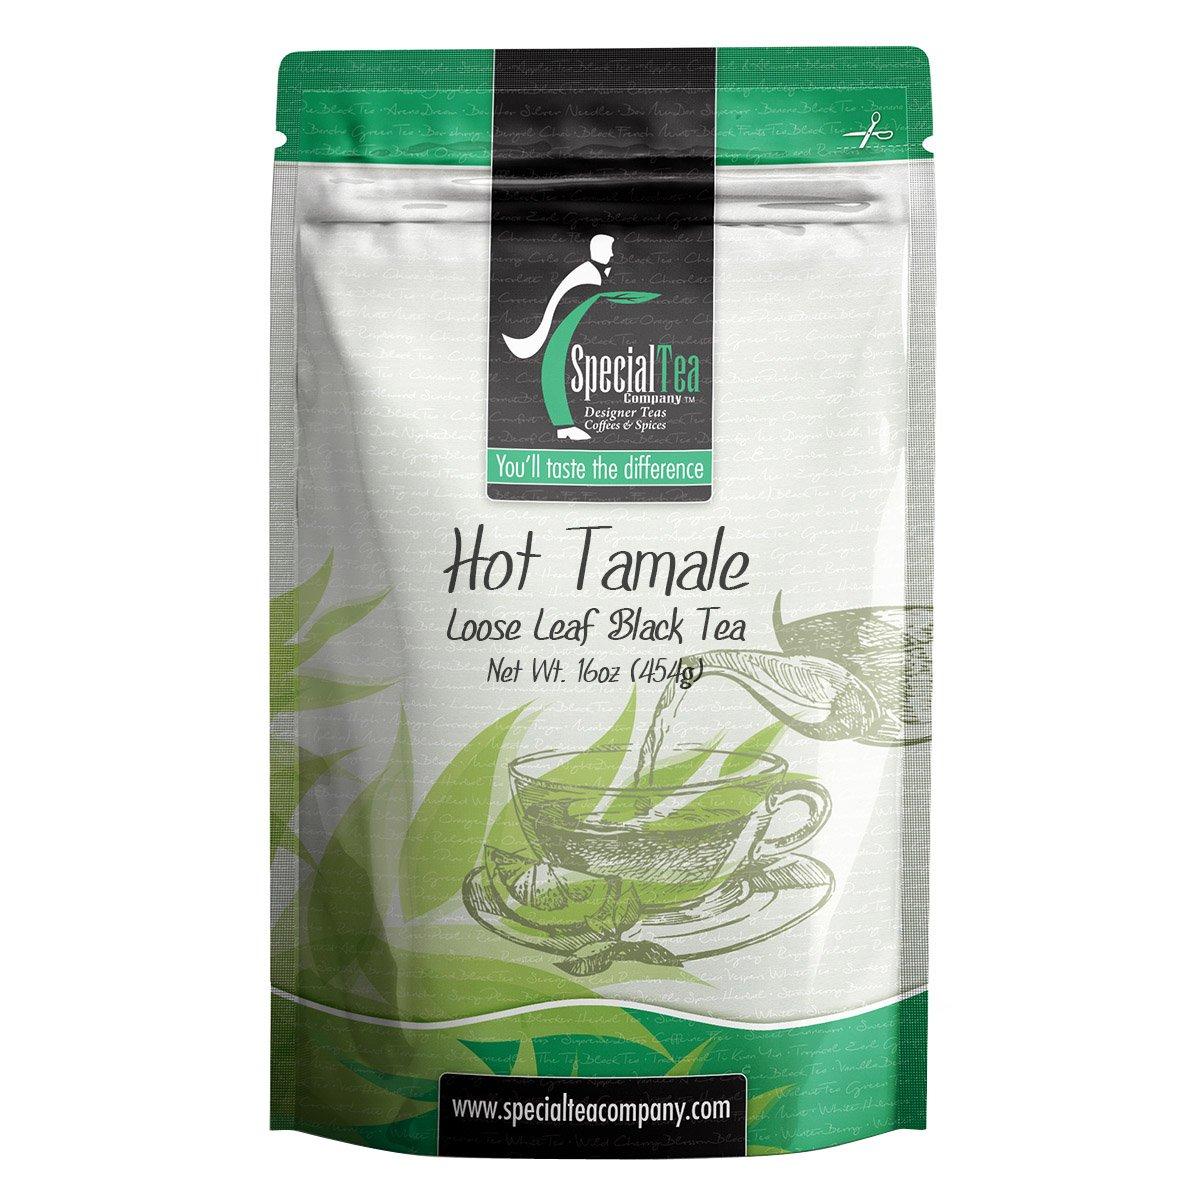 Special Tea Hot Tamale Loose Leaf Black Tea, 16 Ounce